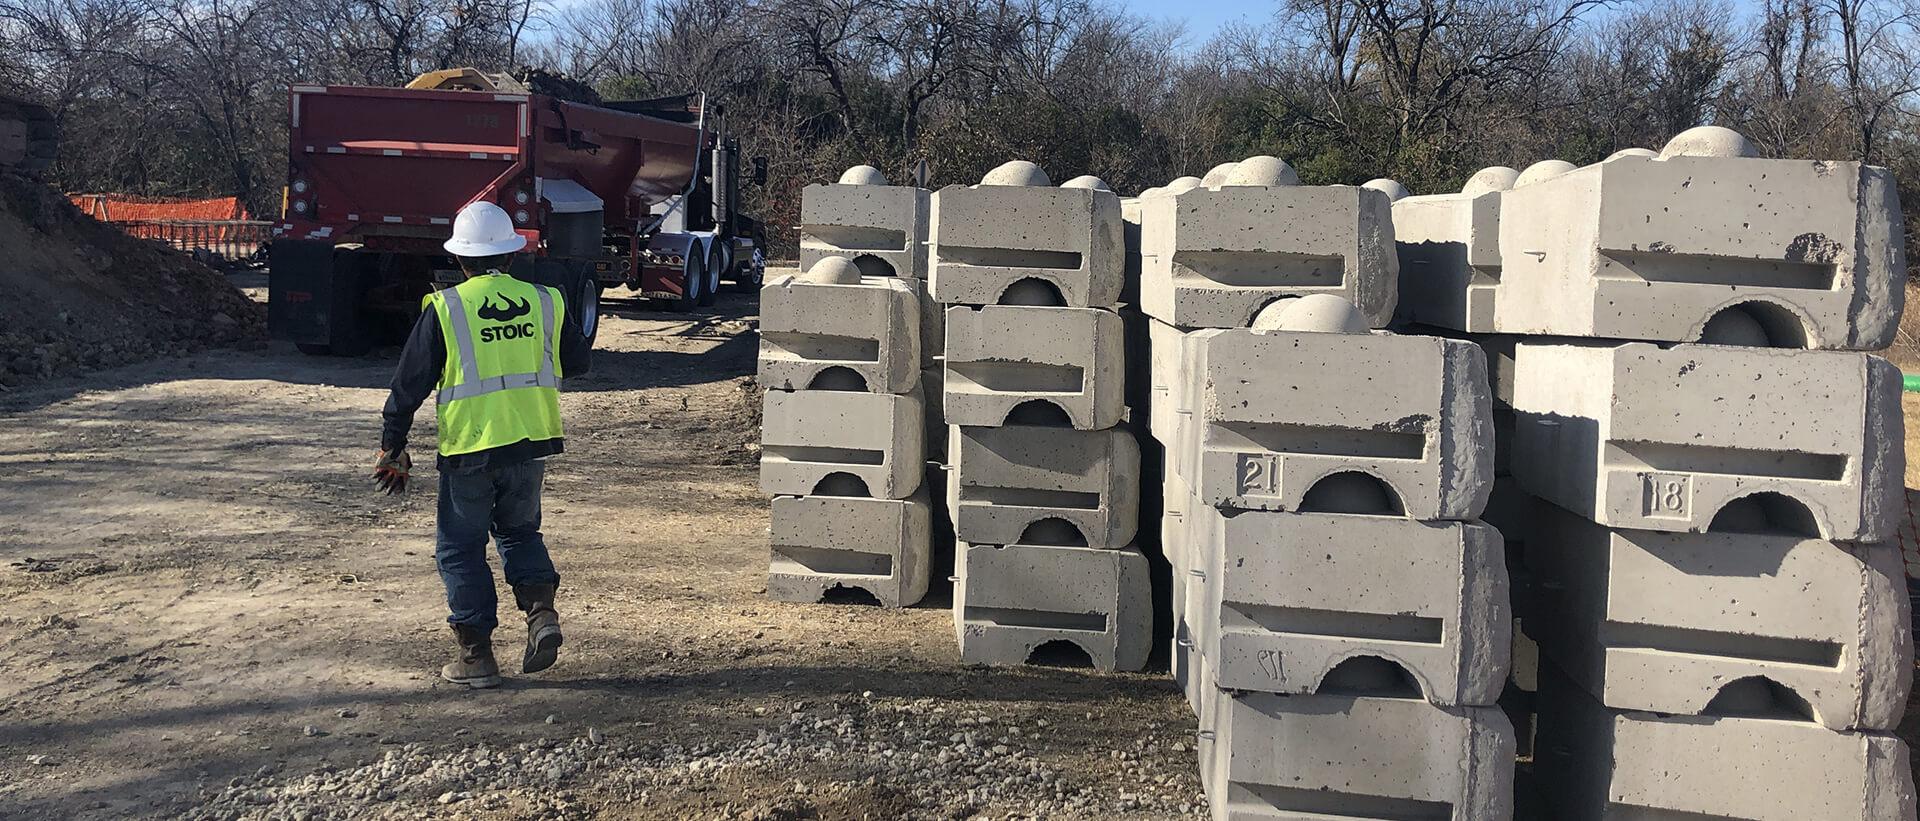 Stoic Civil Construction, Inc.